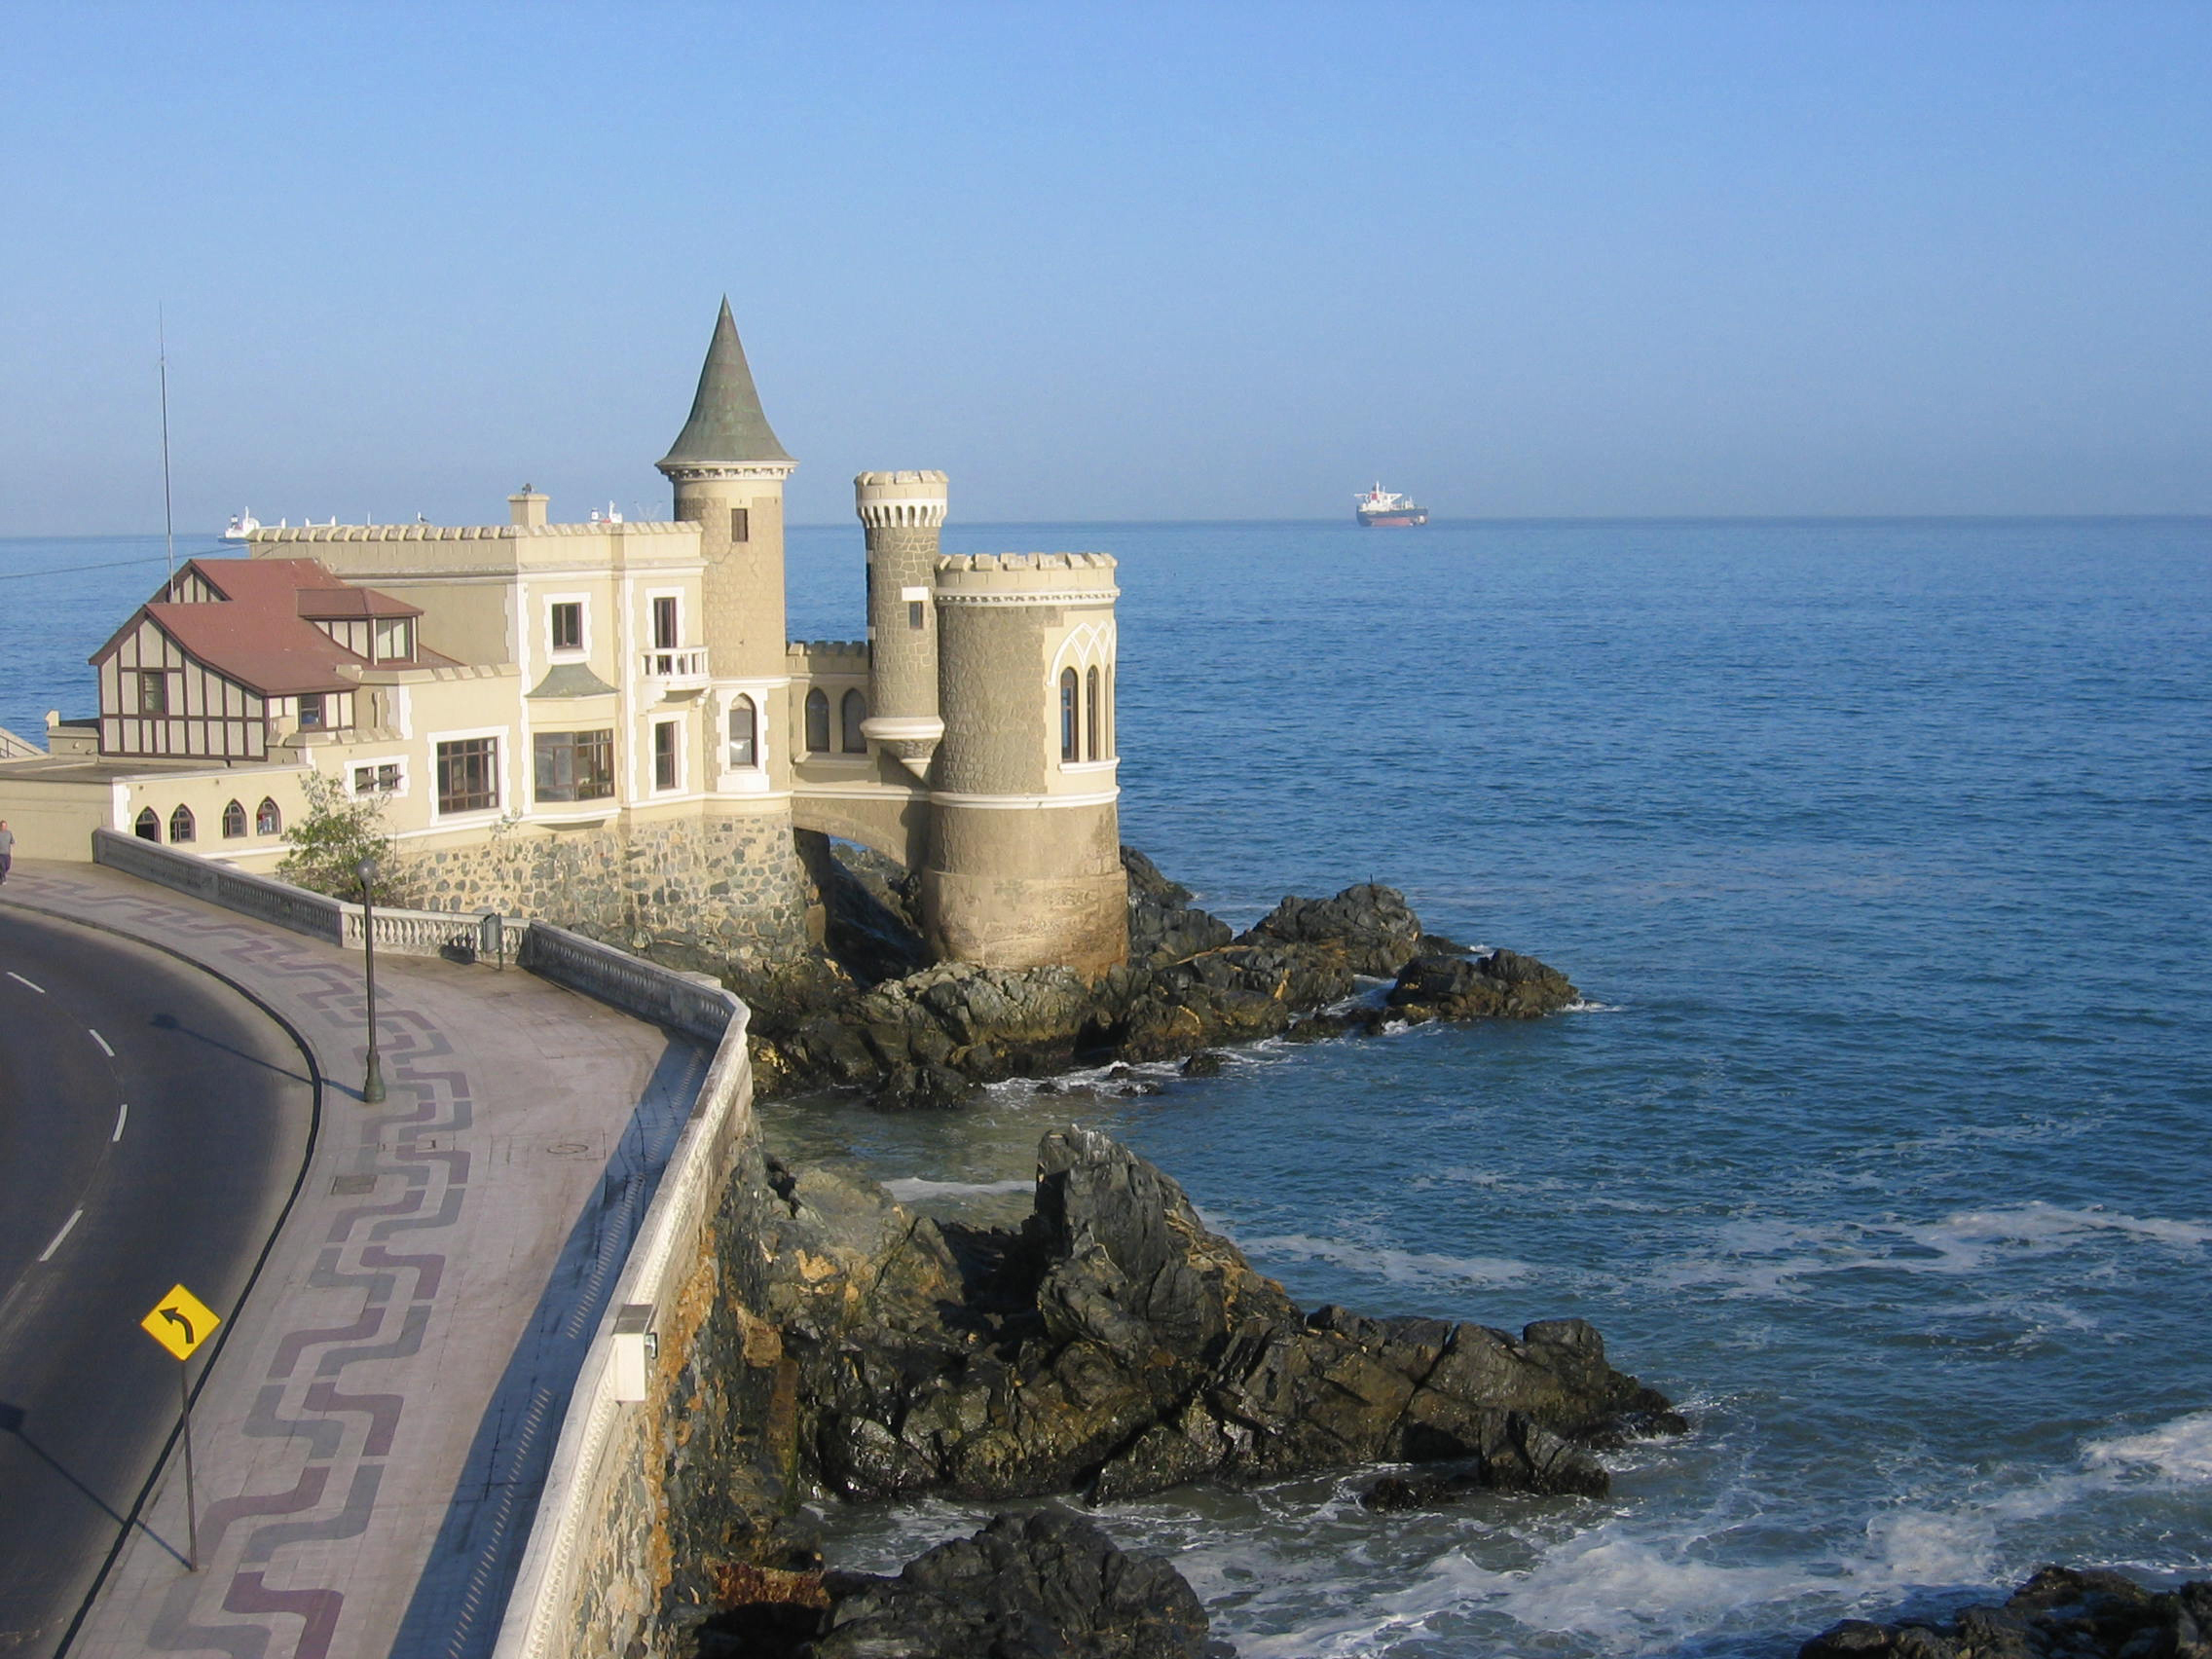 Castillo Wulff, castelo histórico construído em 1906 localizado aos pés do Cerro Castillo, em Viña del Mar